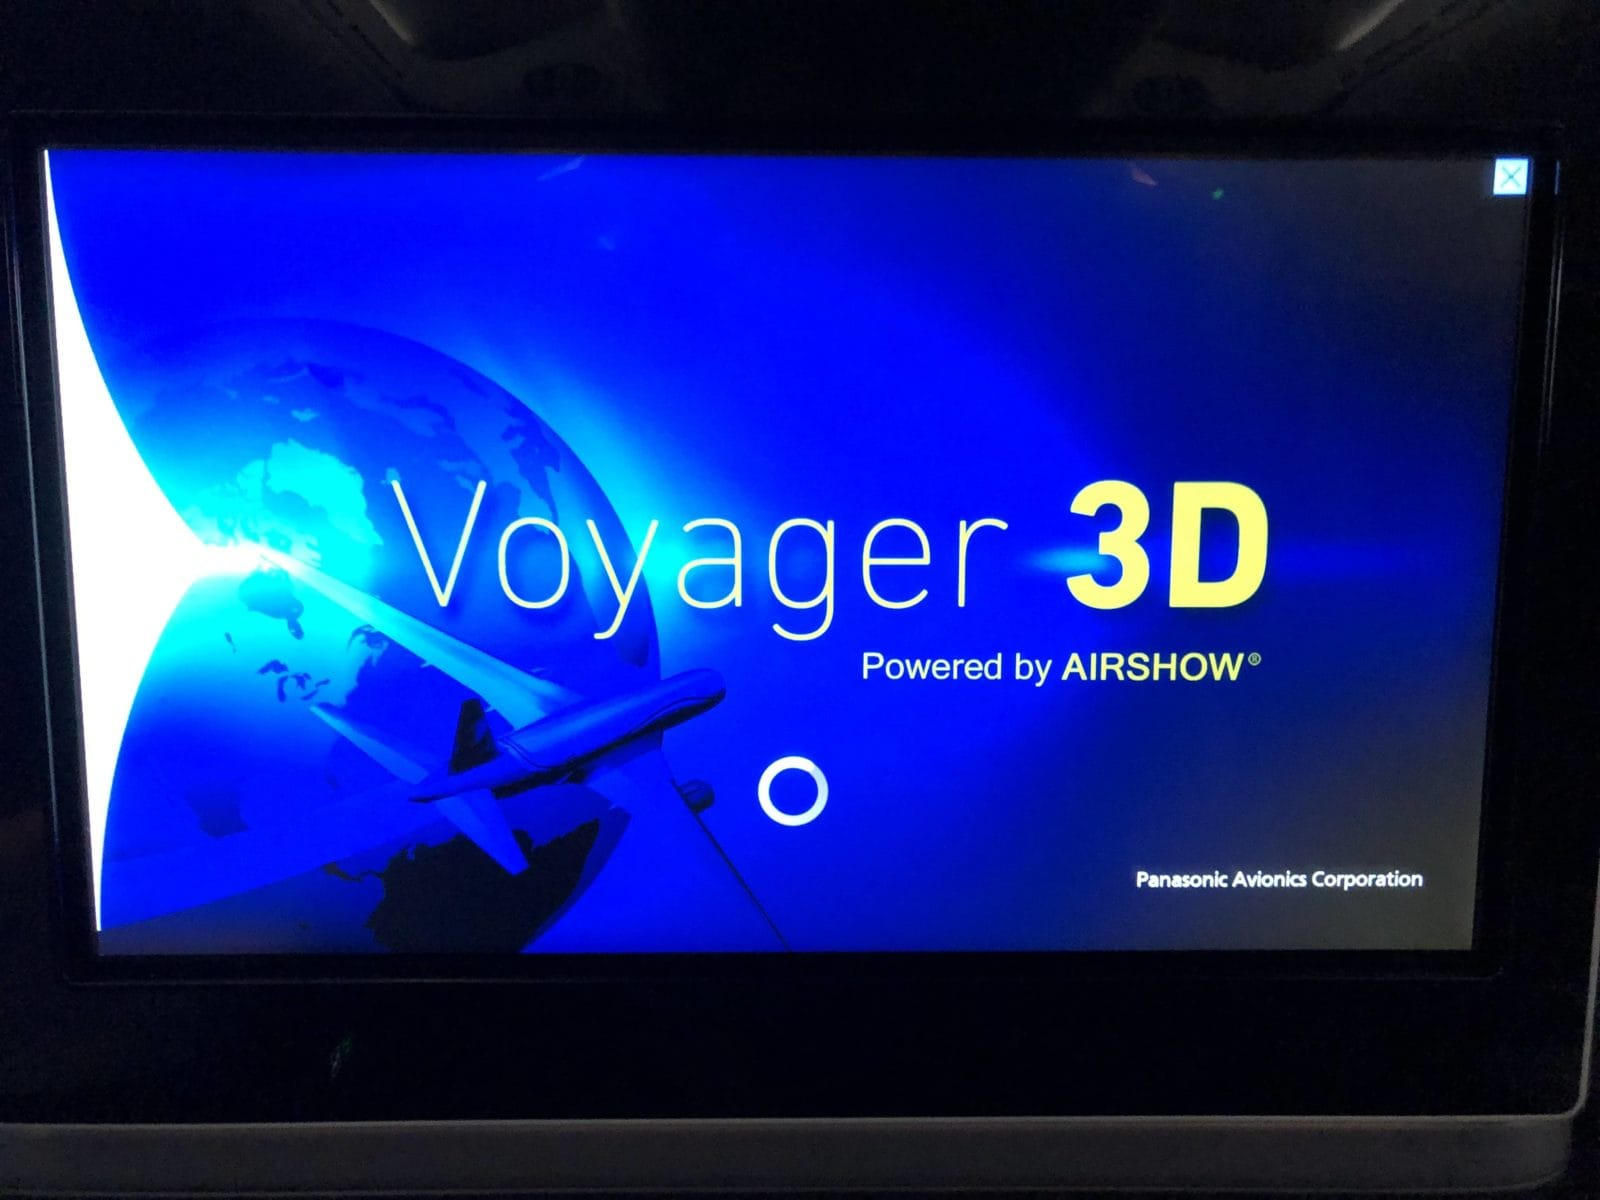 EVA Air neue Business Class 787-9 Voyager 3D